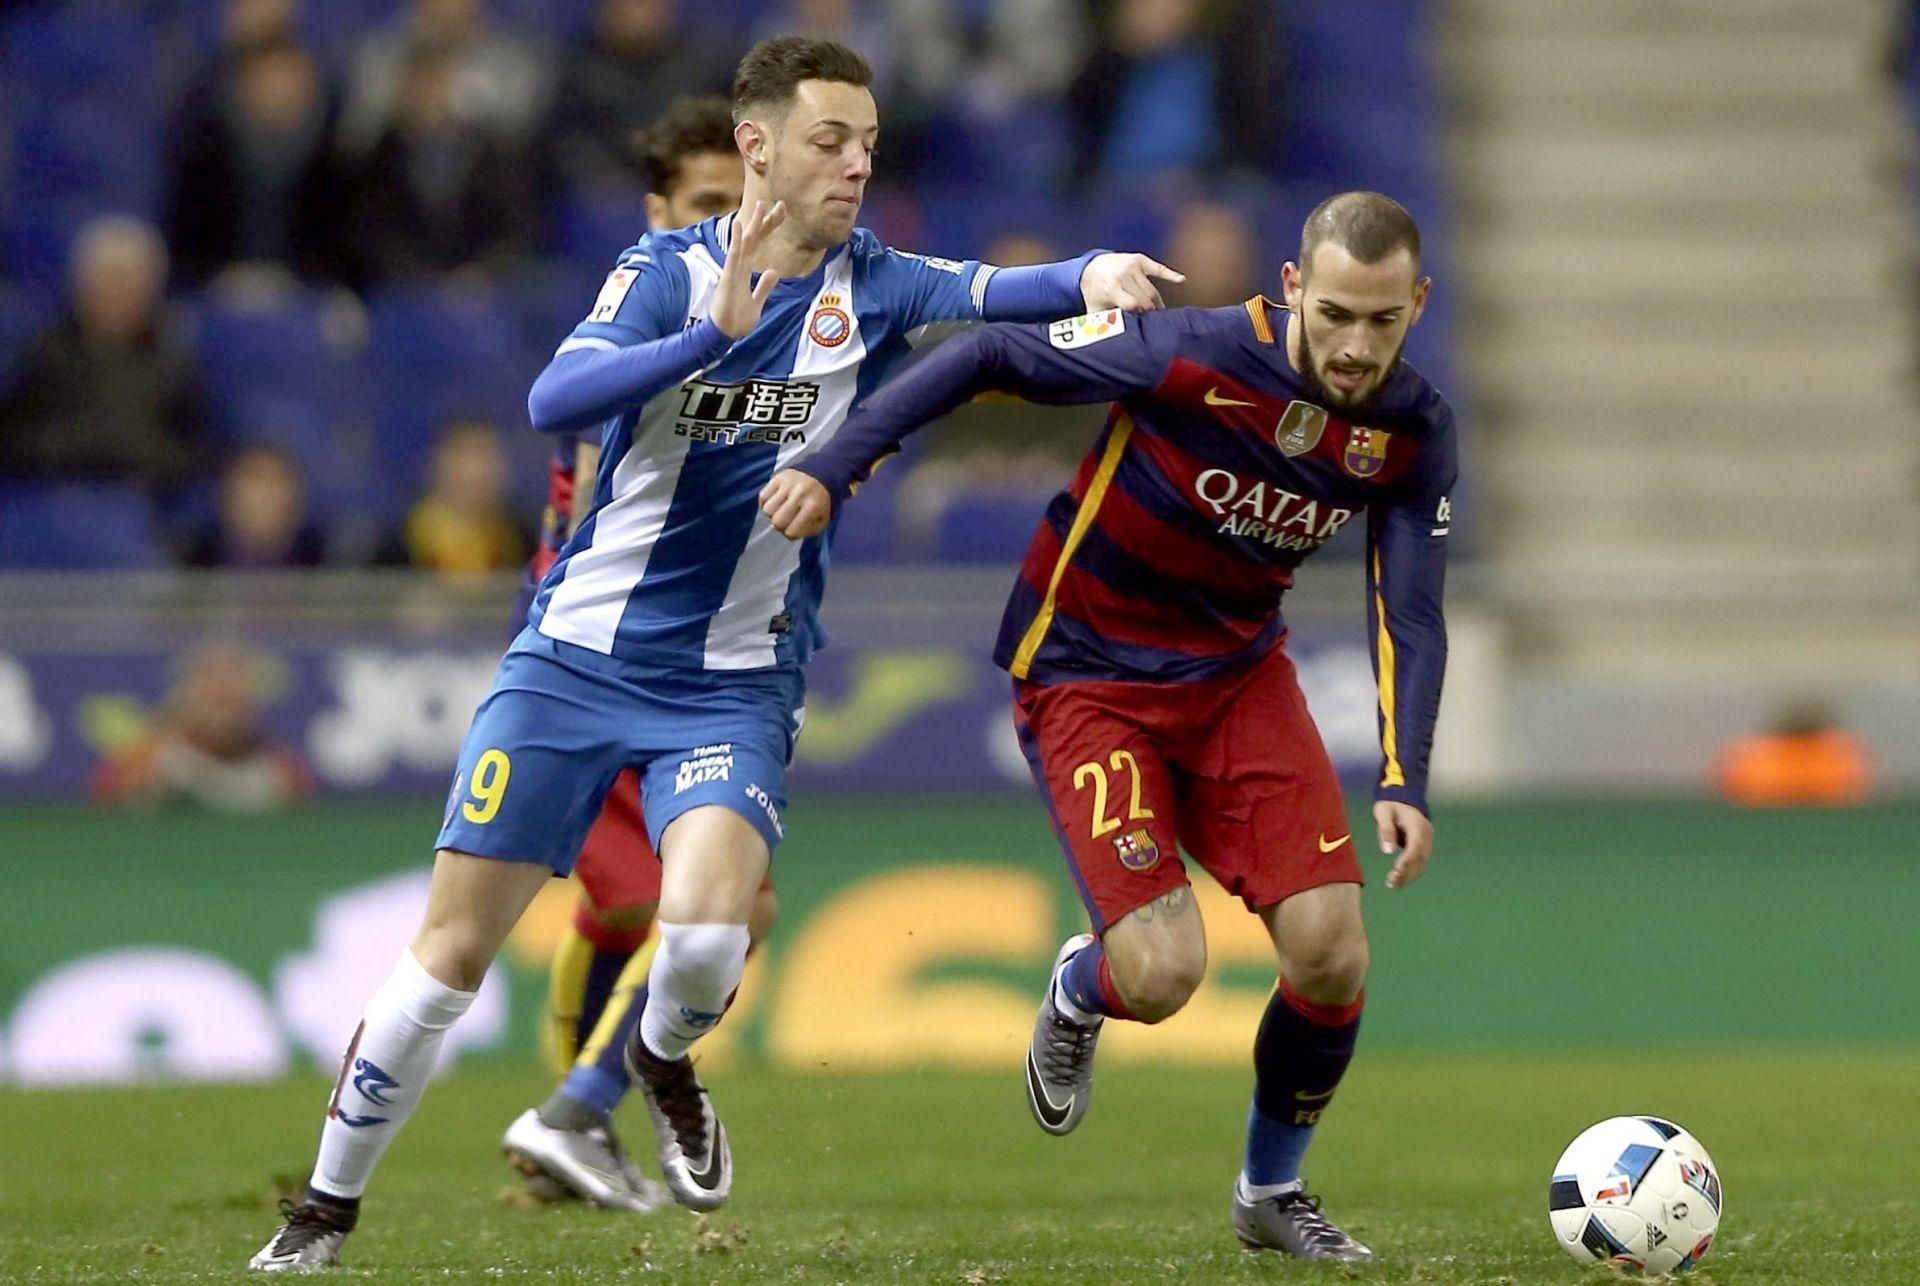 KUP KRALJA Slavlja Barcelone, Celte, Athletica i Las Palmasa